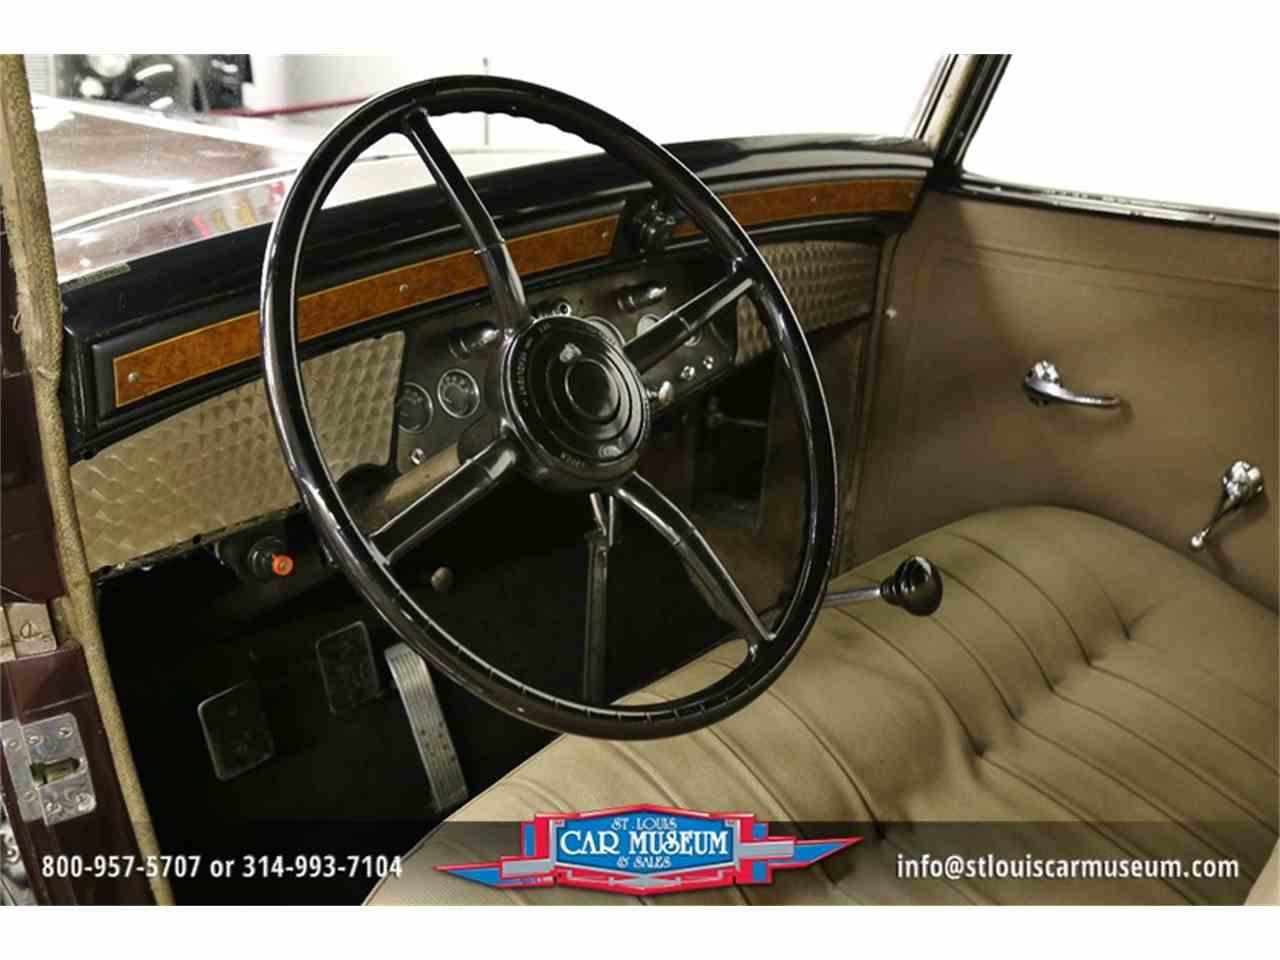 Large Picture of '31 Cadillac V-16 Madam X Landau Sedan - $374,900.00 Offered by St. Louis Car Museum - JSU3